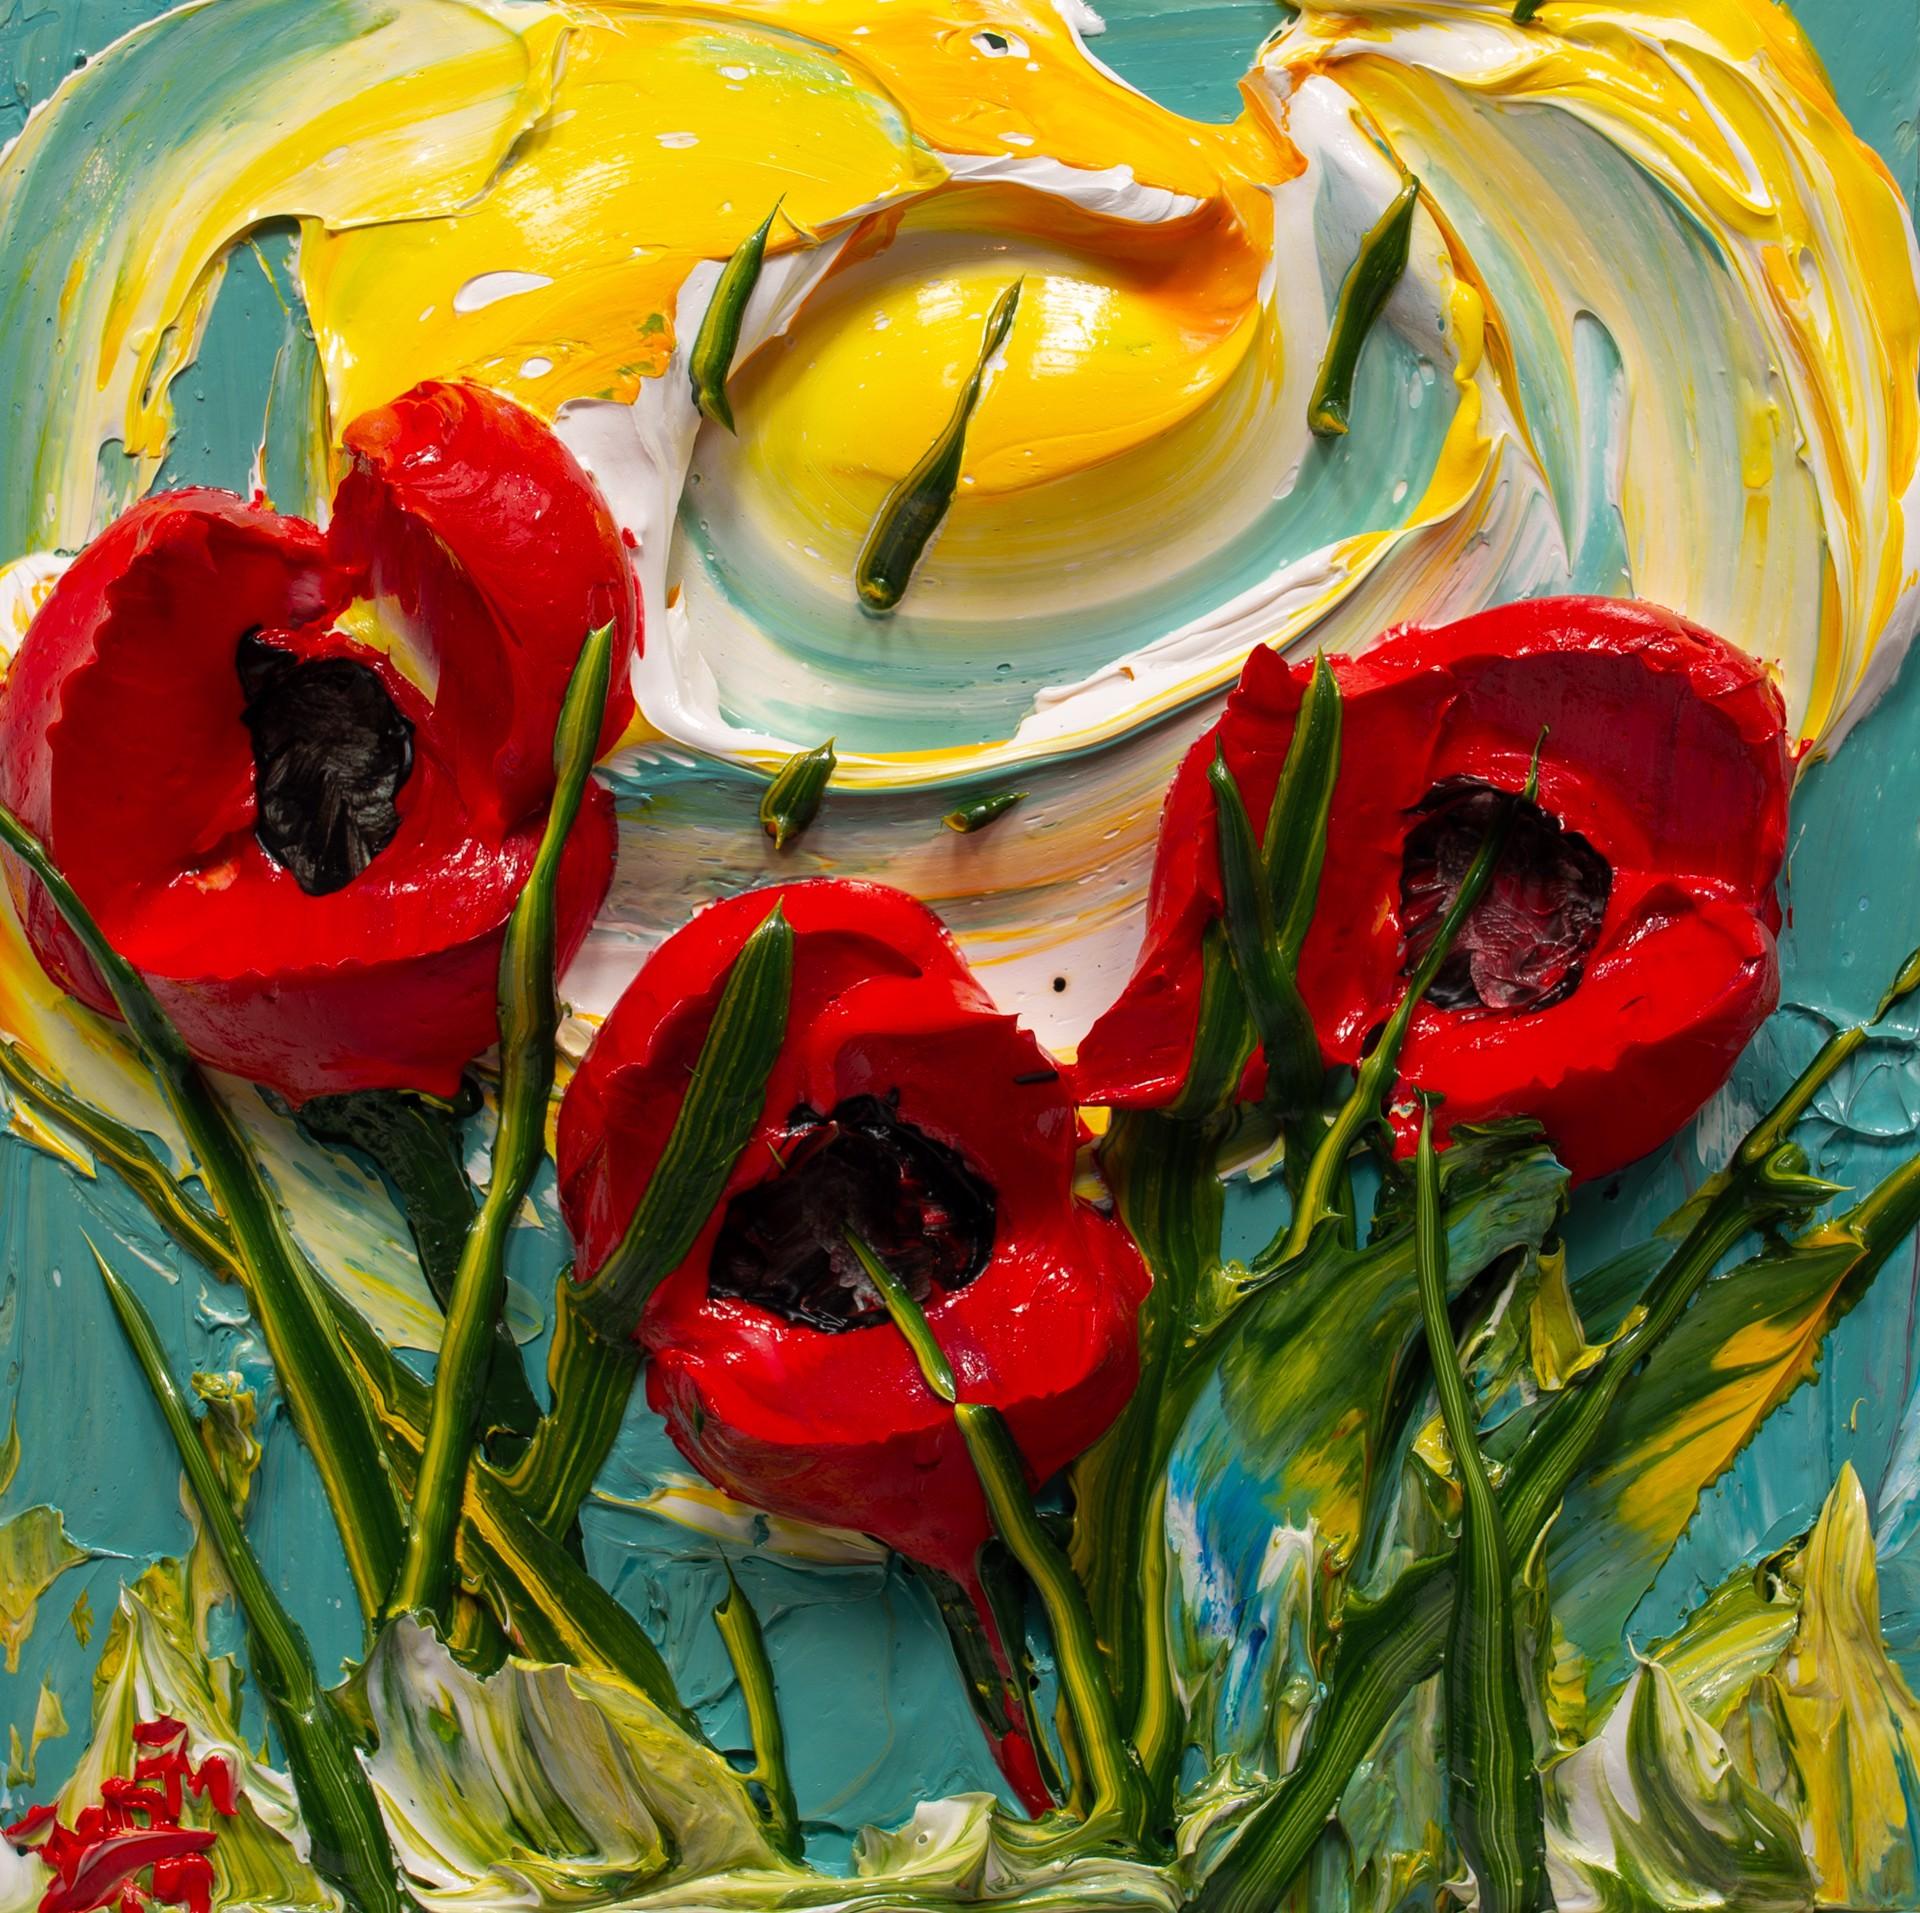 POPPY FLOWERS-PF-12X12-2019-176 by JUSTIN GAFFREY